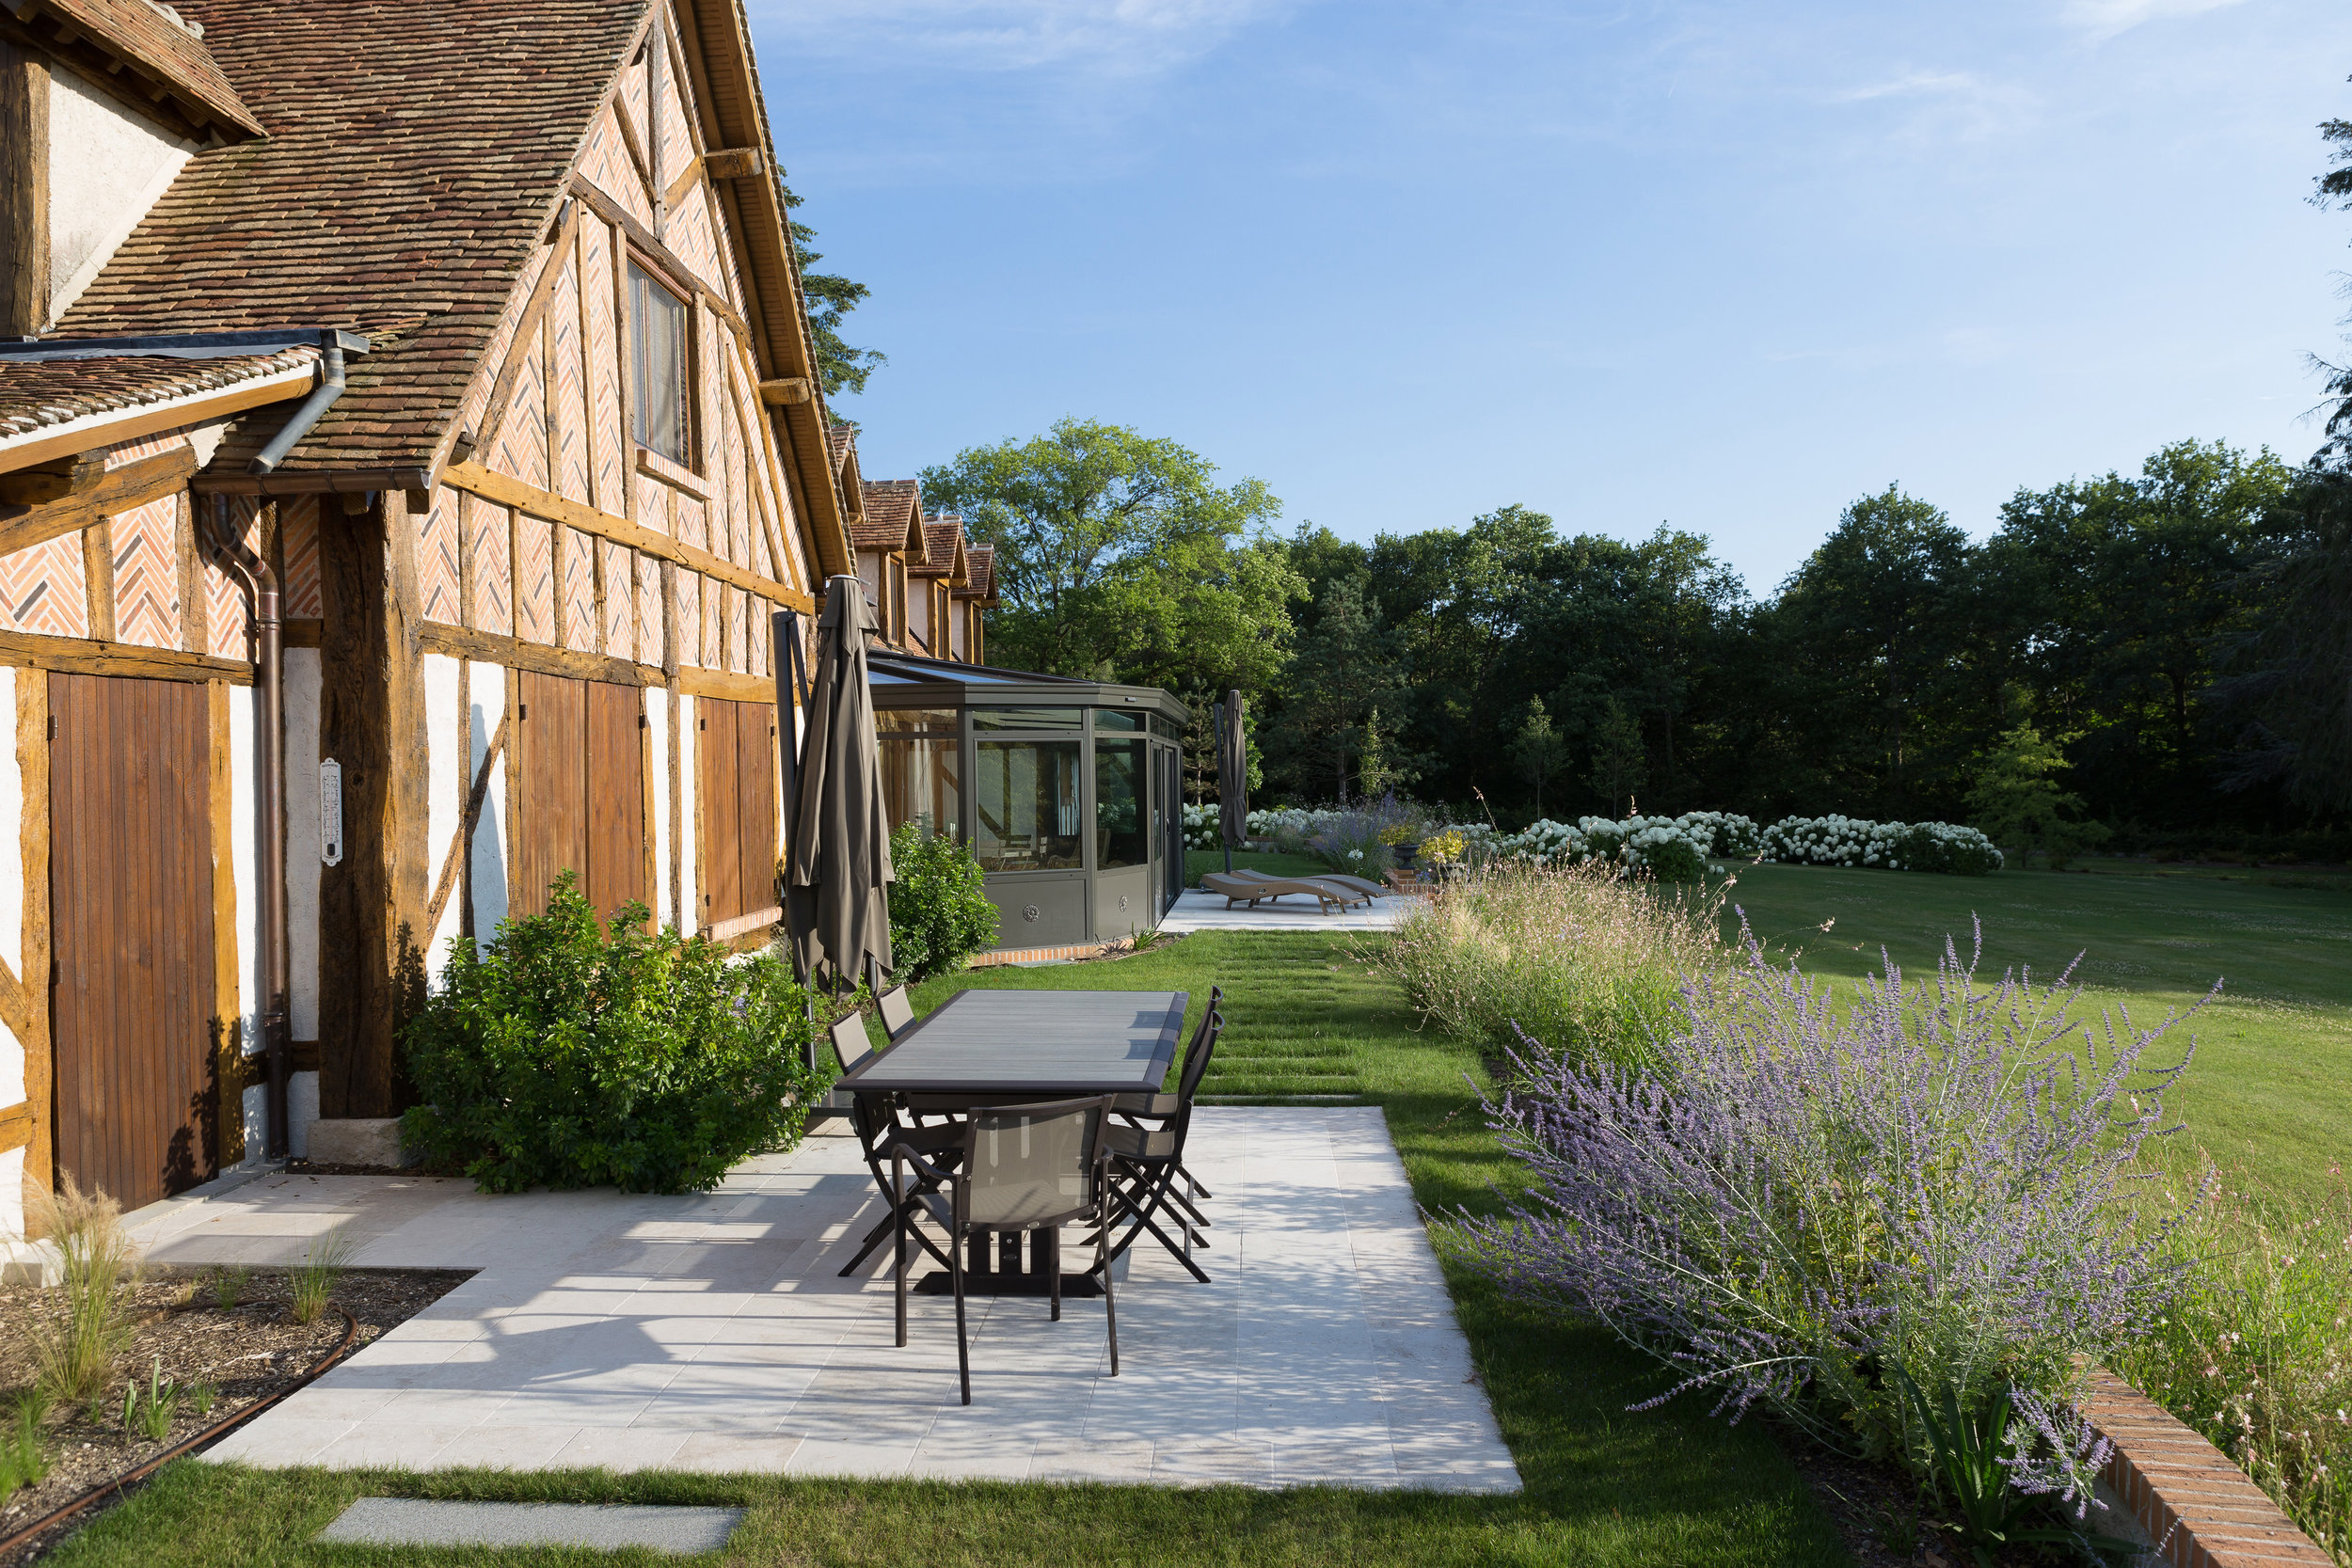 jardin_privé_vouzon_sologne_terrasses_jardins_outdoor_design_christophe_gautrand_paysagiste_7.jpg